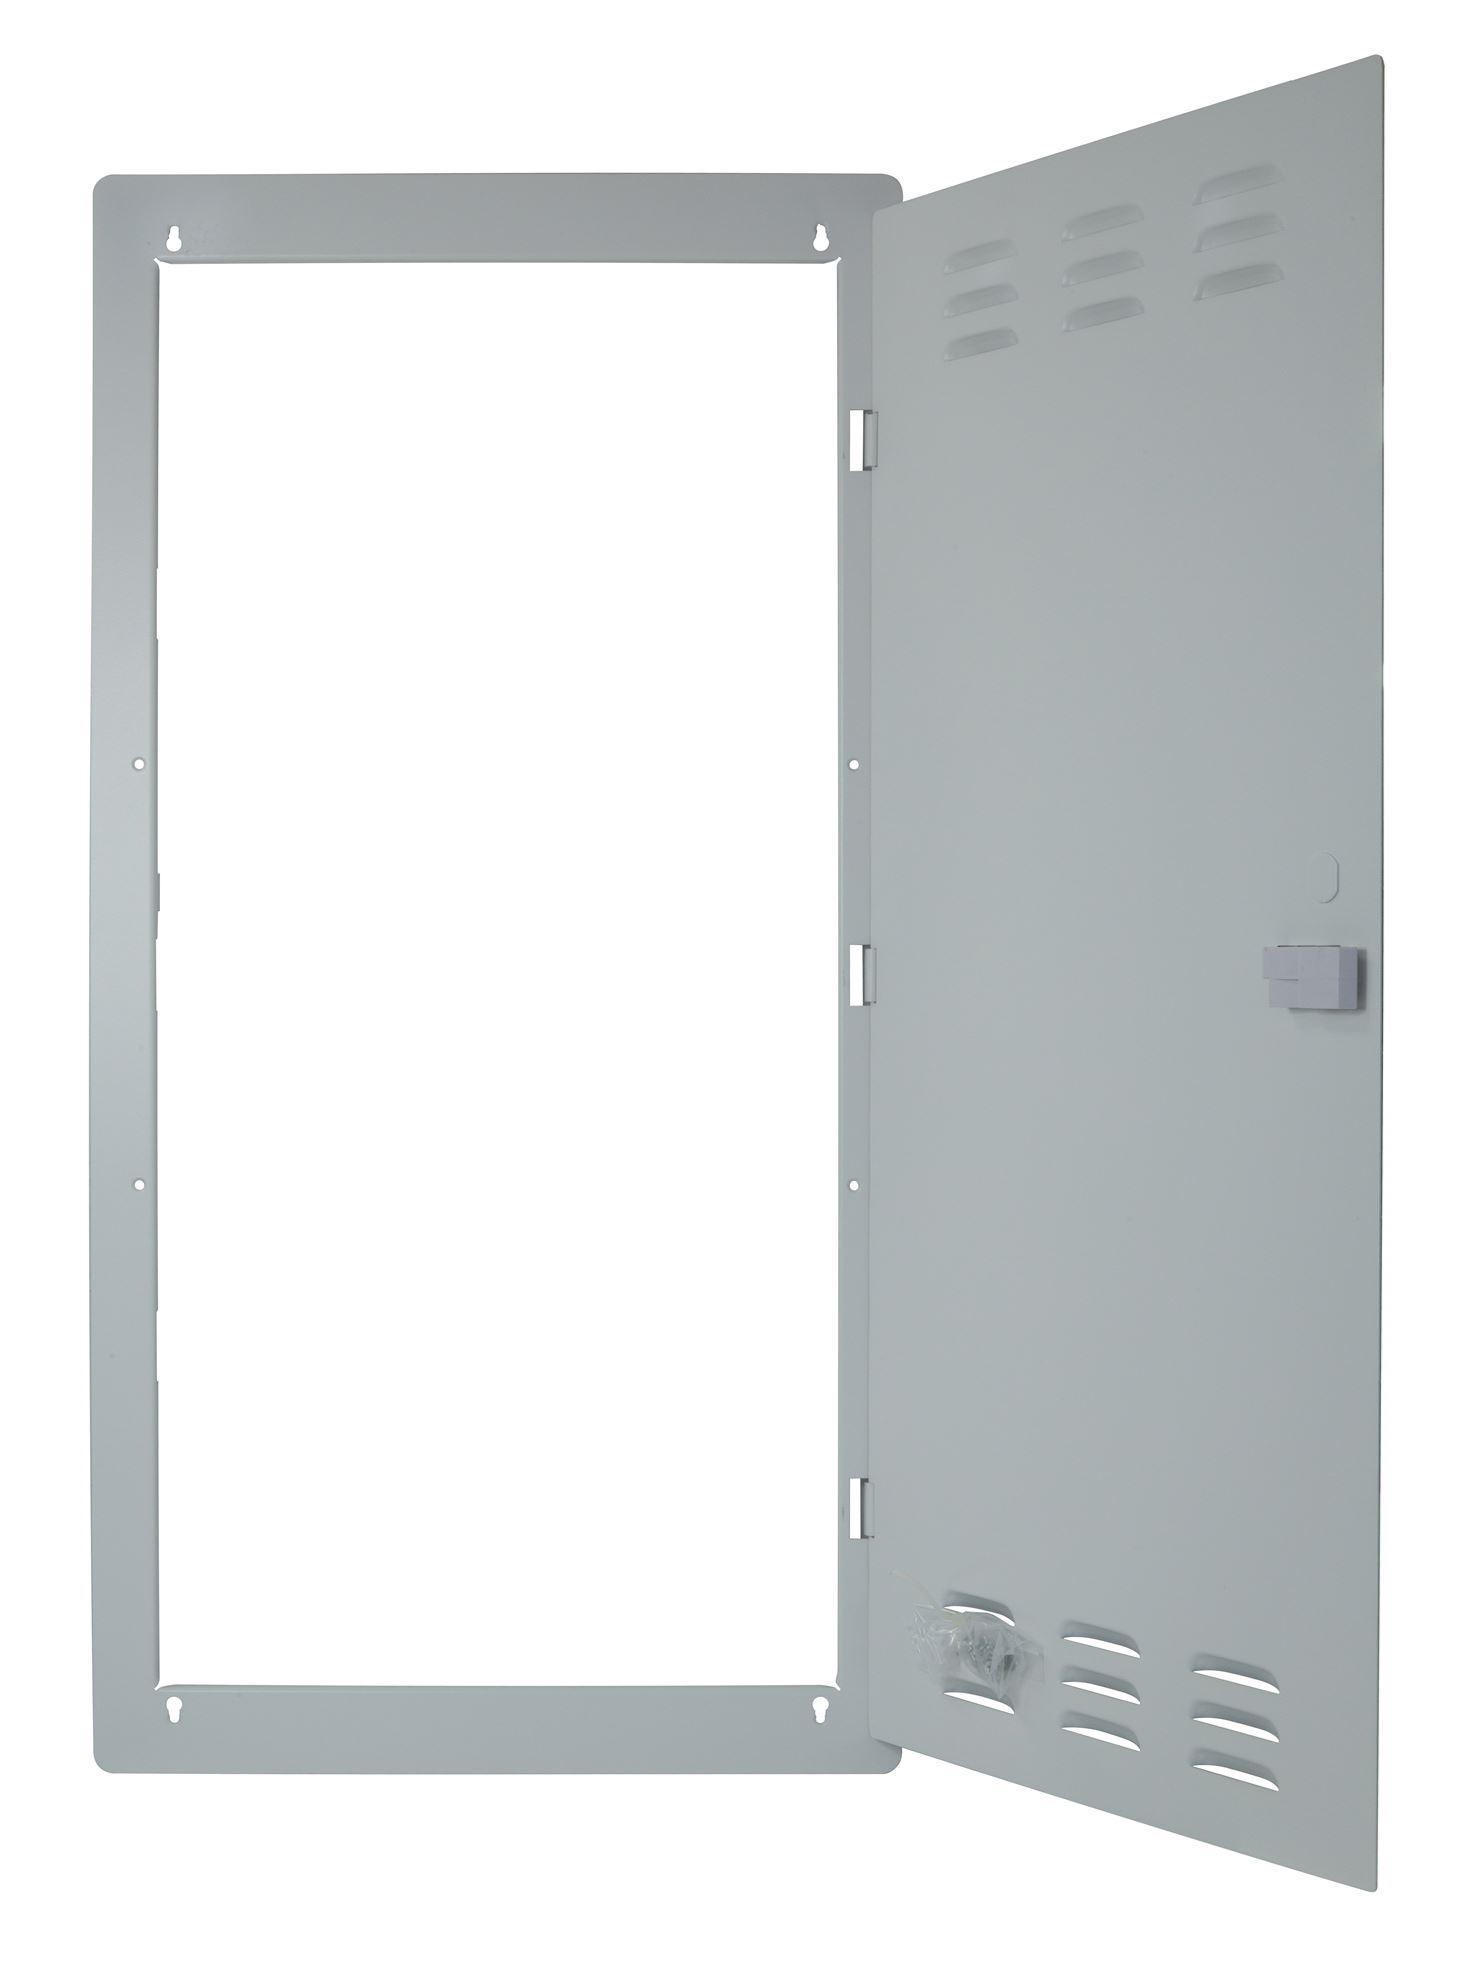 DYNAMIX Flush Mount Front Door for 2804V2 Recessed Enclosure Left to Right